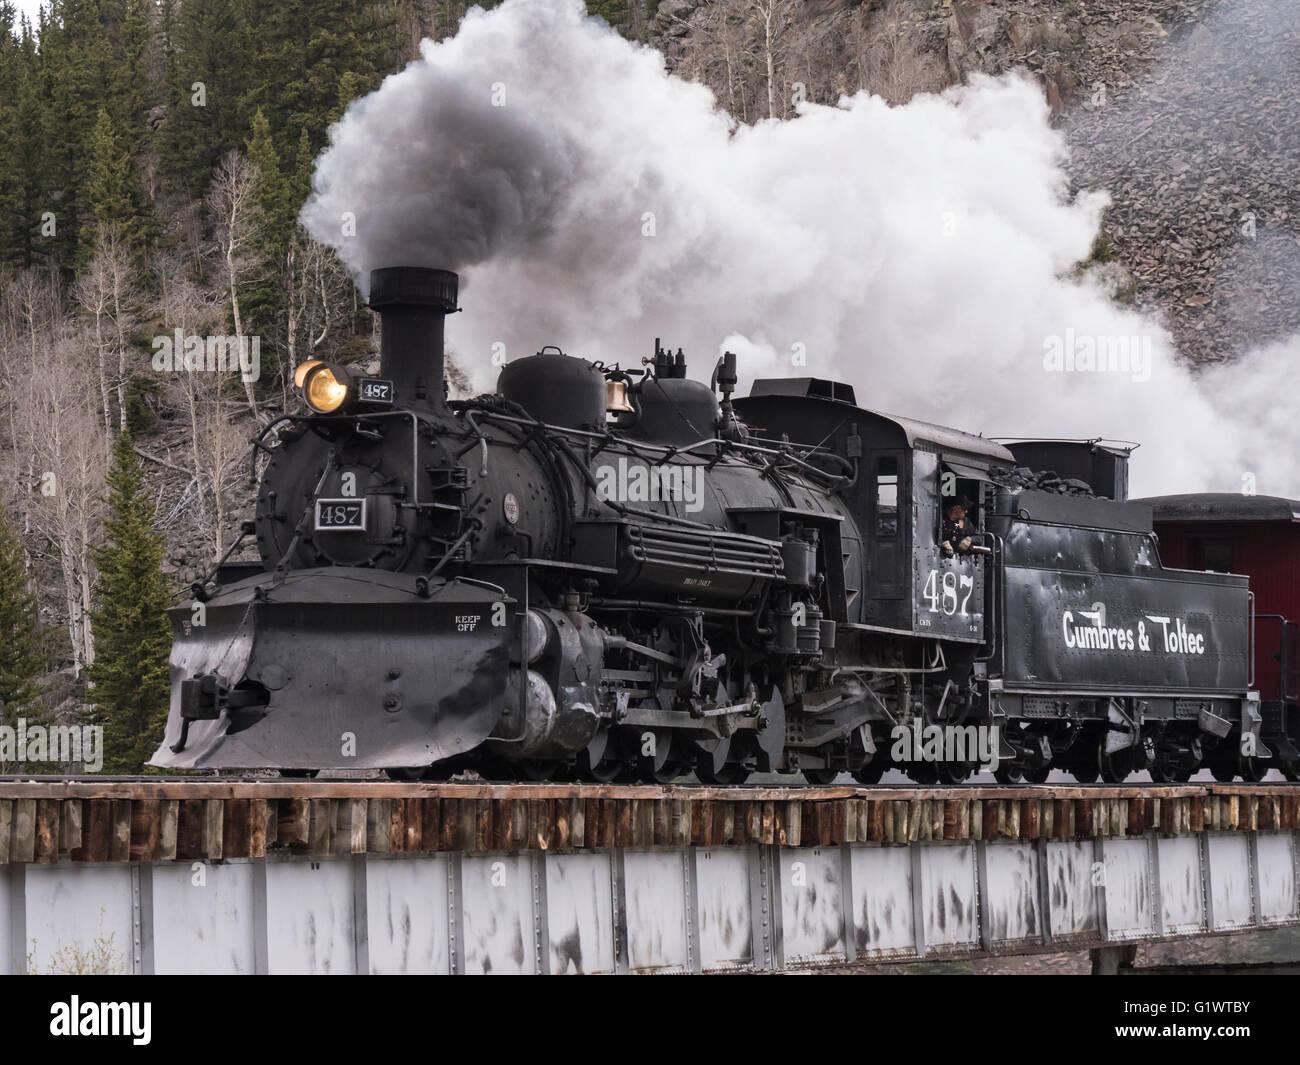 Locomotive 487 crosses Cascade Trestle, Cumbres & Toltec Scenic Railroad between Chama, New Mexico and Antonito, - Stock Image